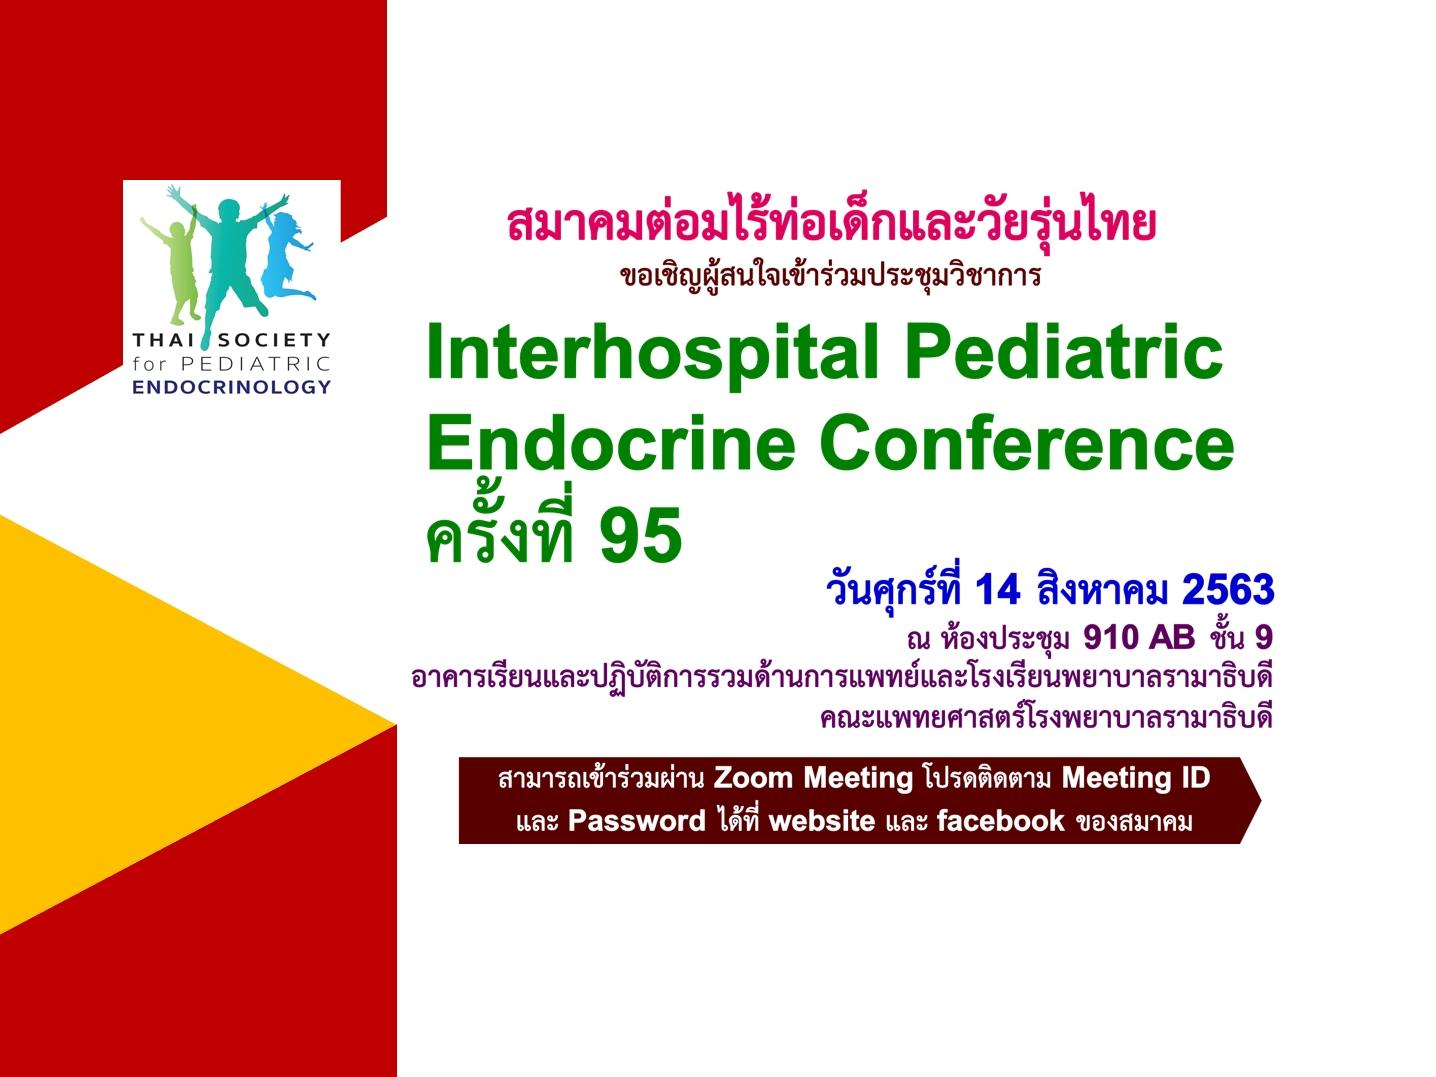 Interhospital Pediatric Endocrine Conference ครั้งที่ 95